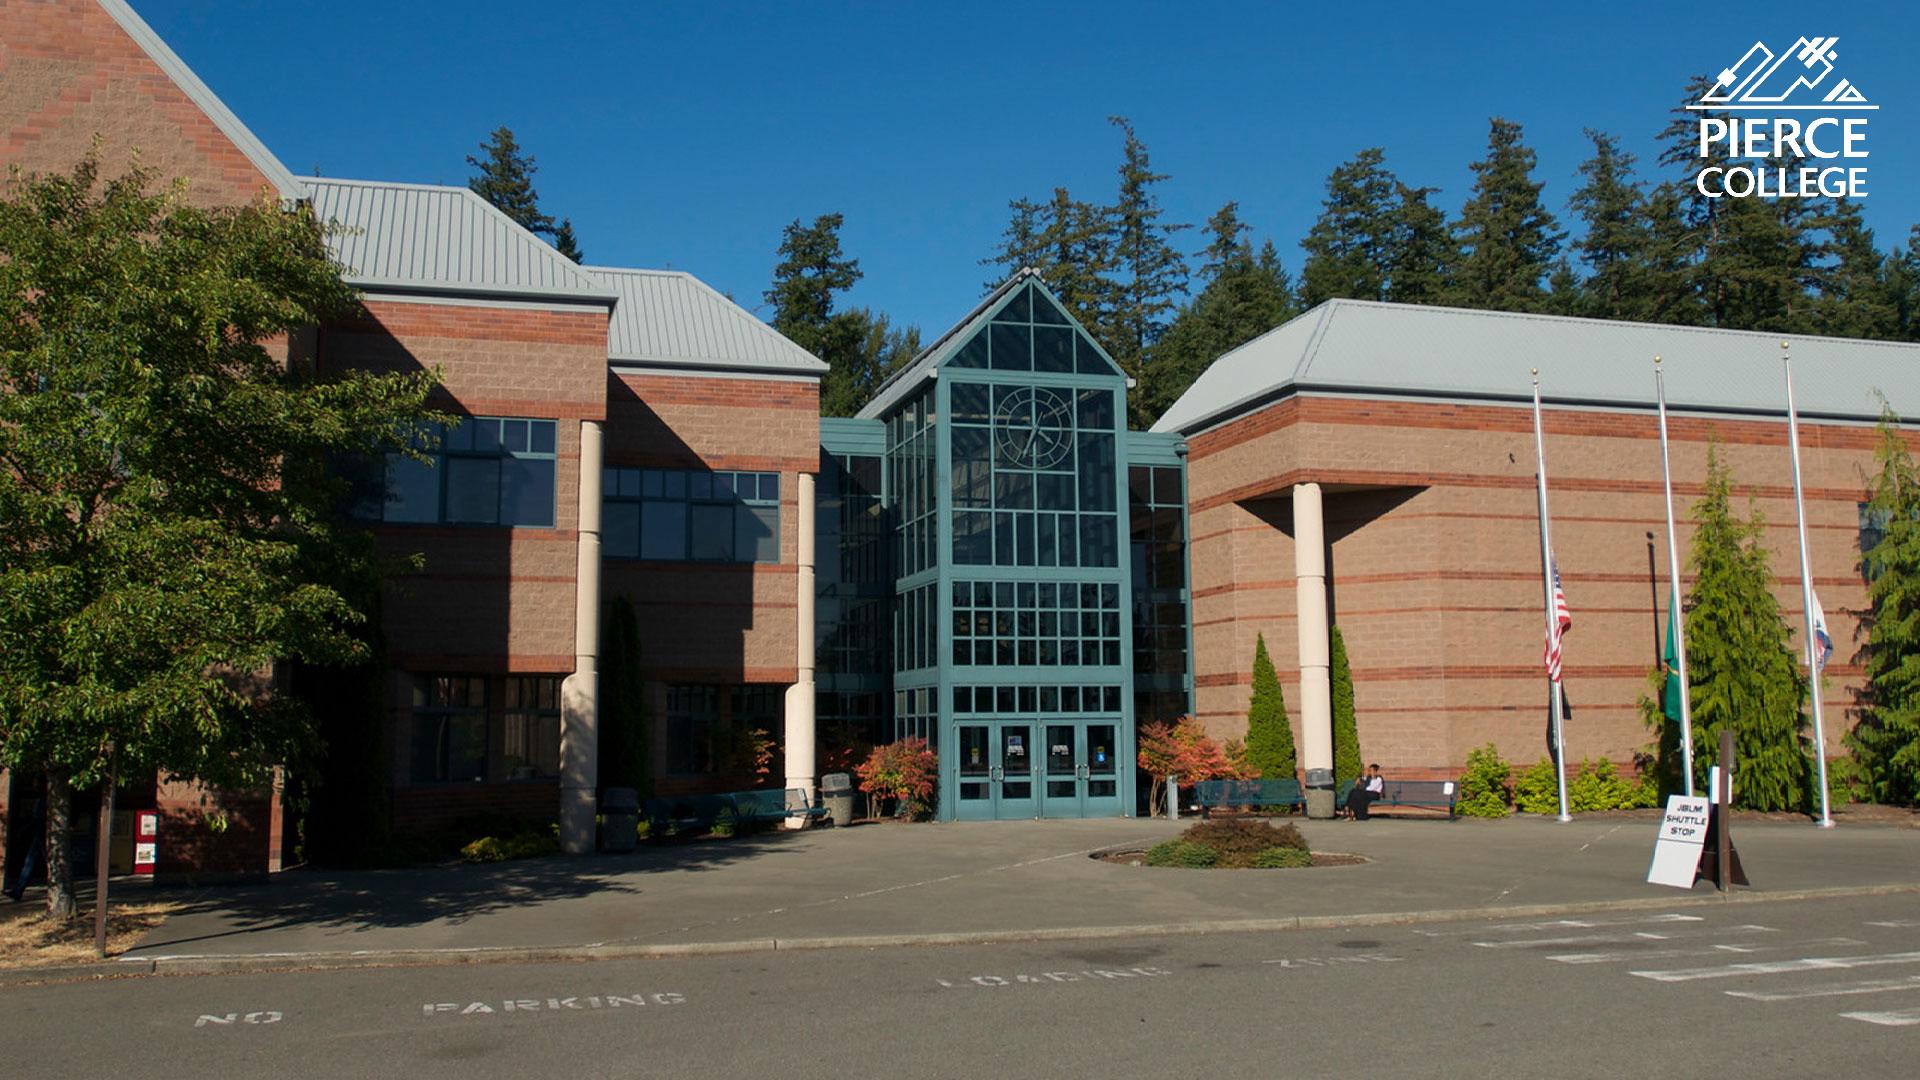 Stone Education Center, JBLM campus